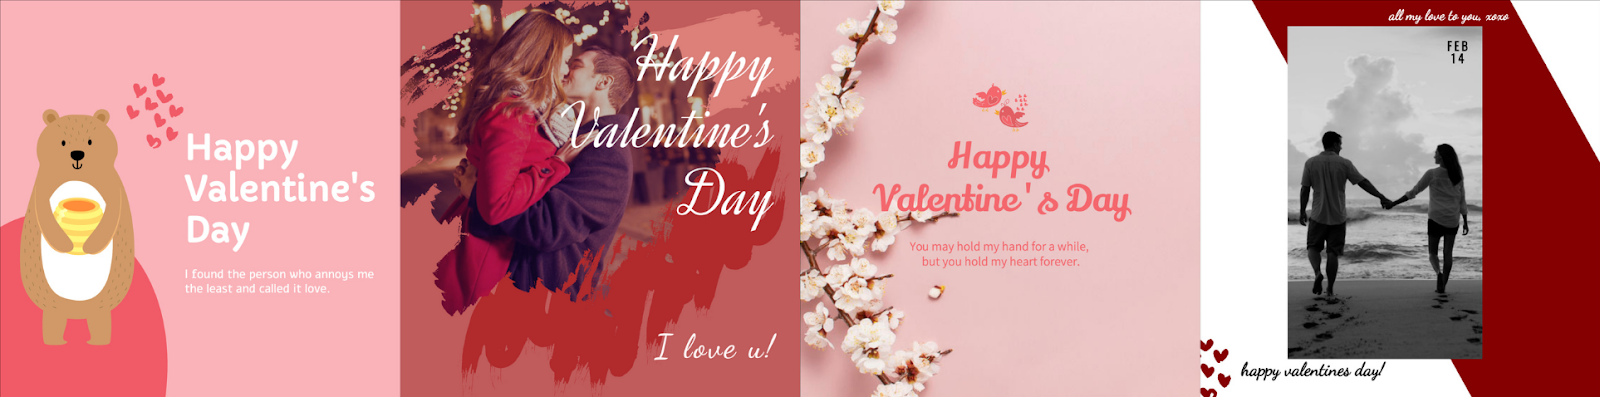 Stunning Valentine's card templates from Designmaker.